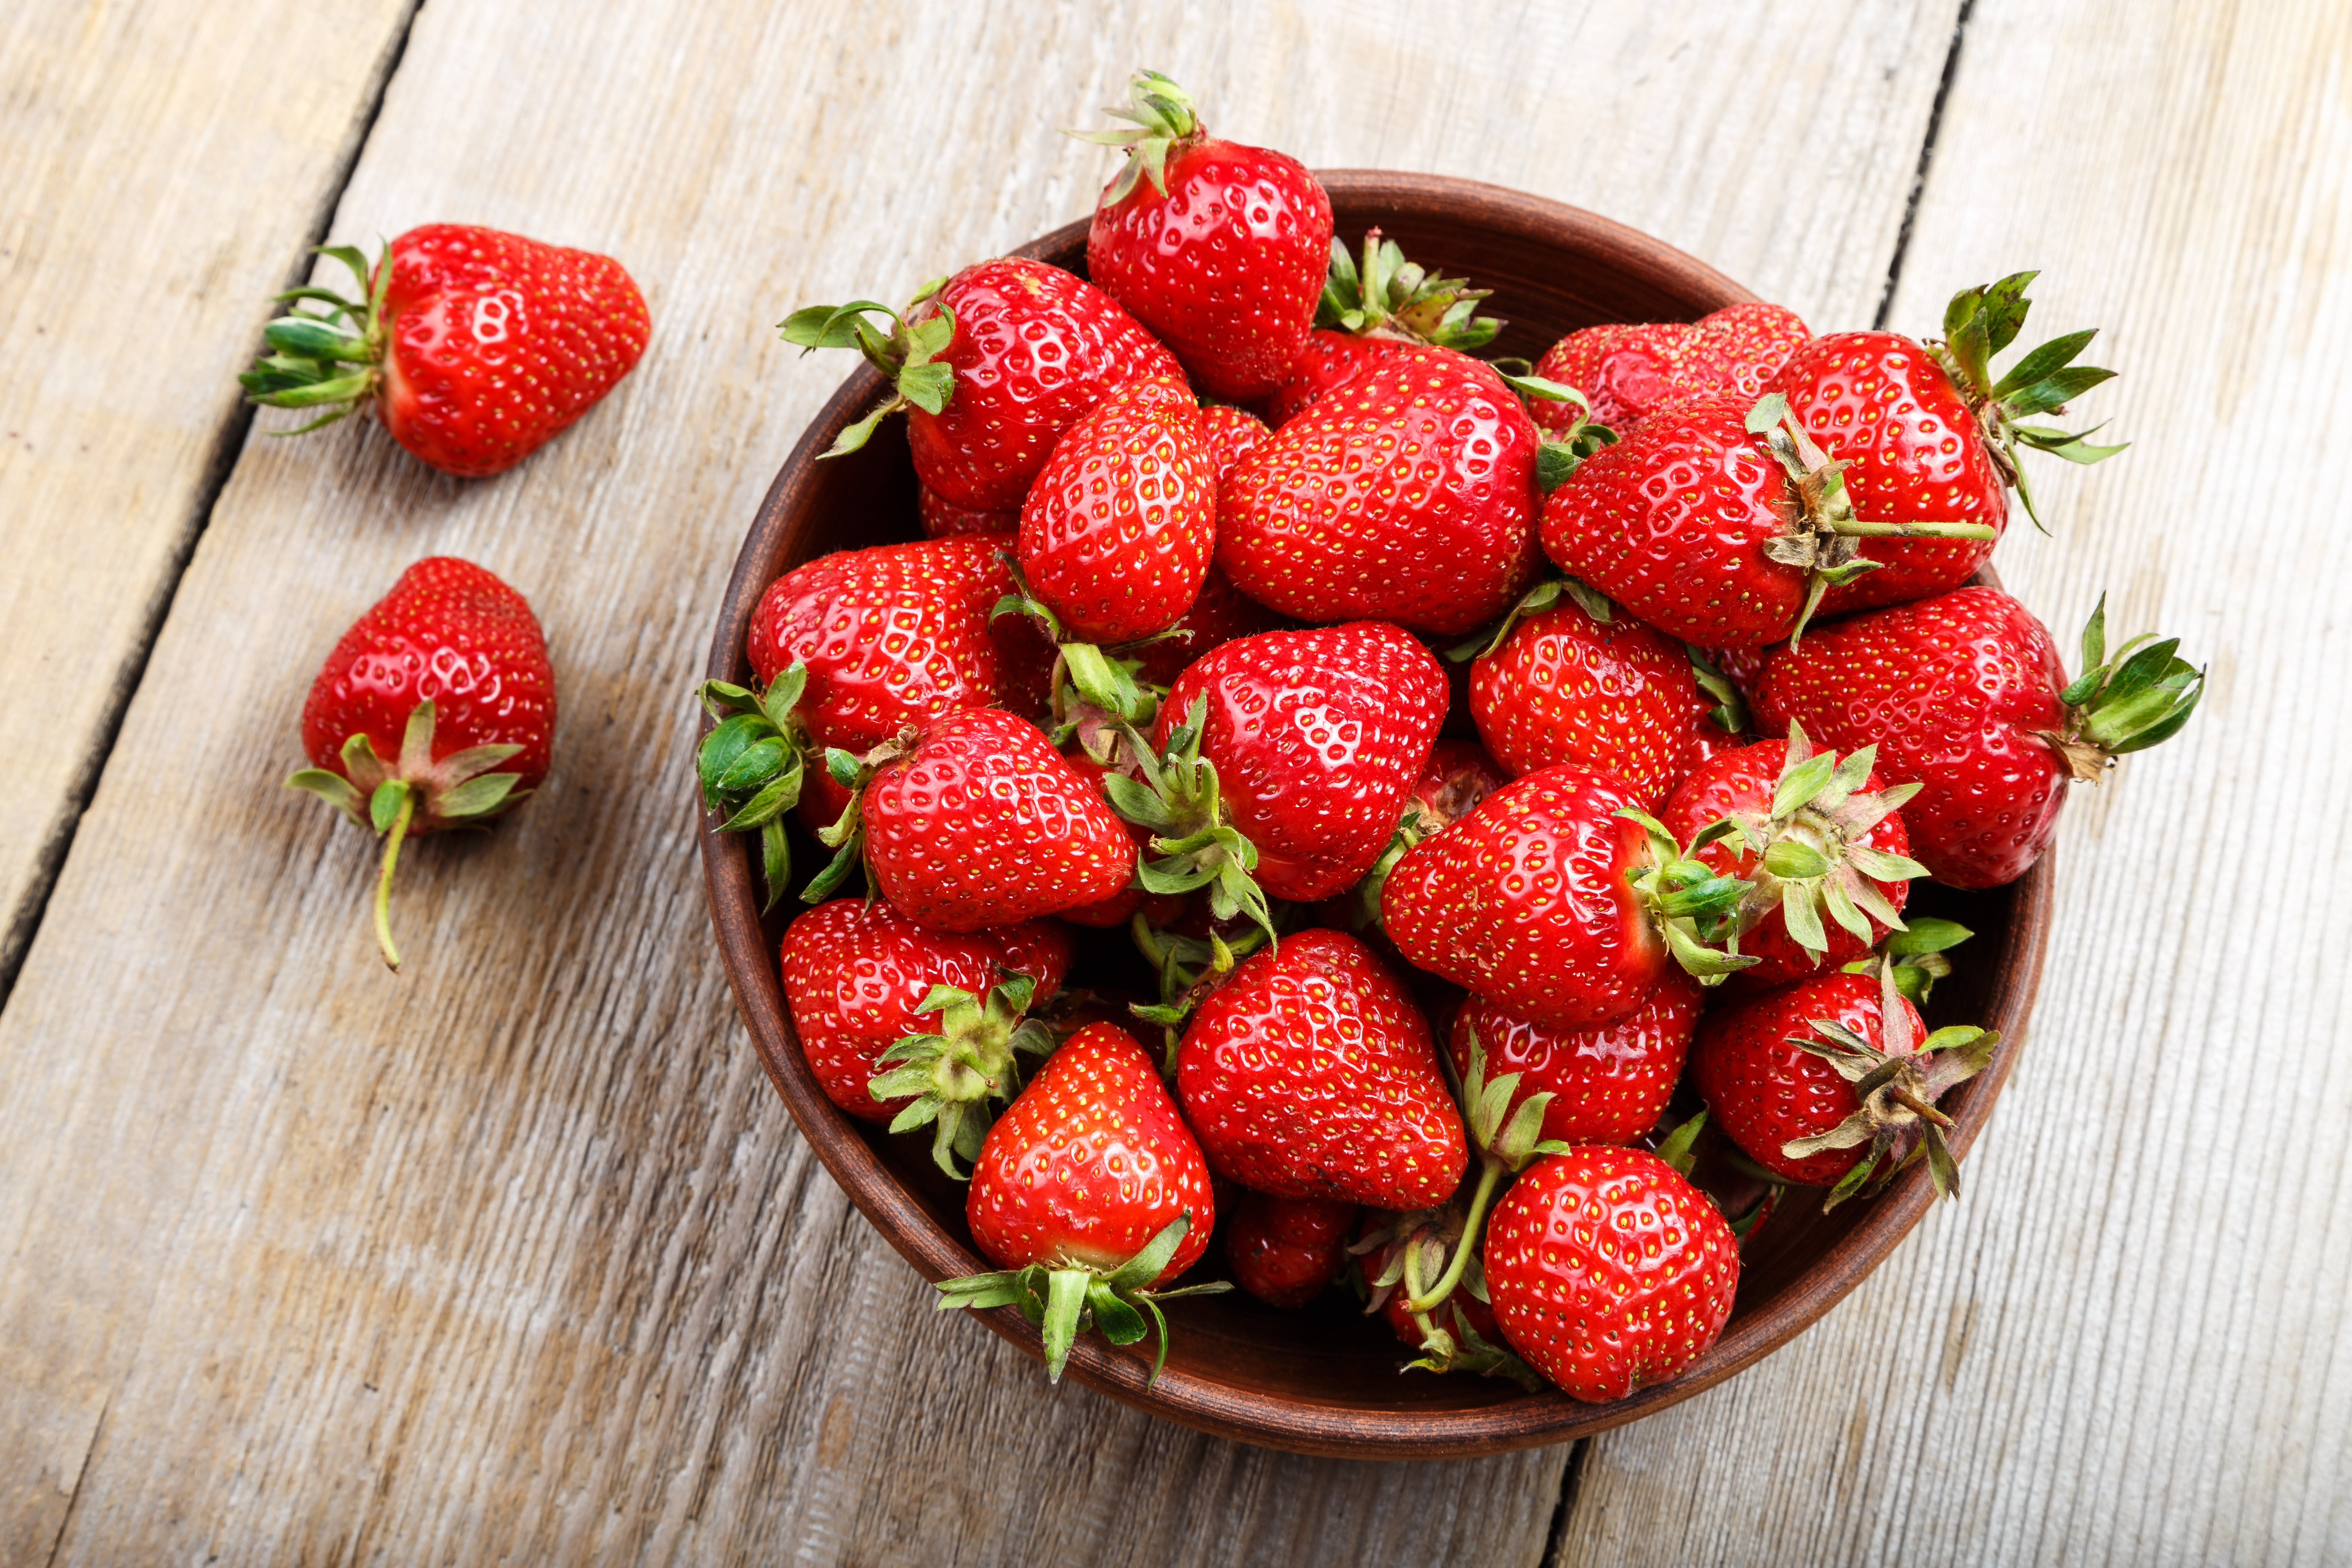 Can Nursing Mothers Eat Strawberries? | Healthy Eating | SF Gate